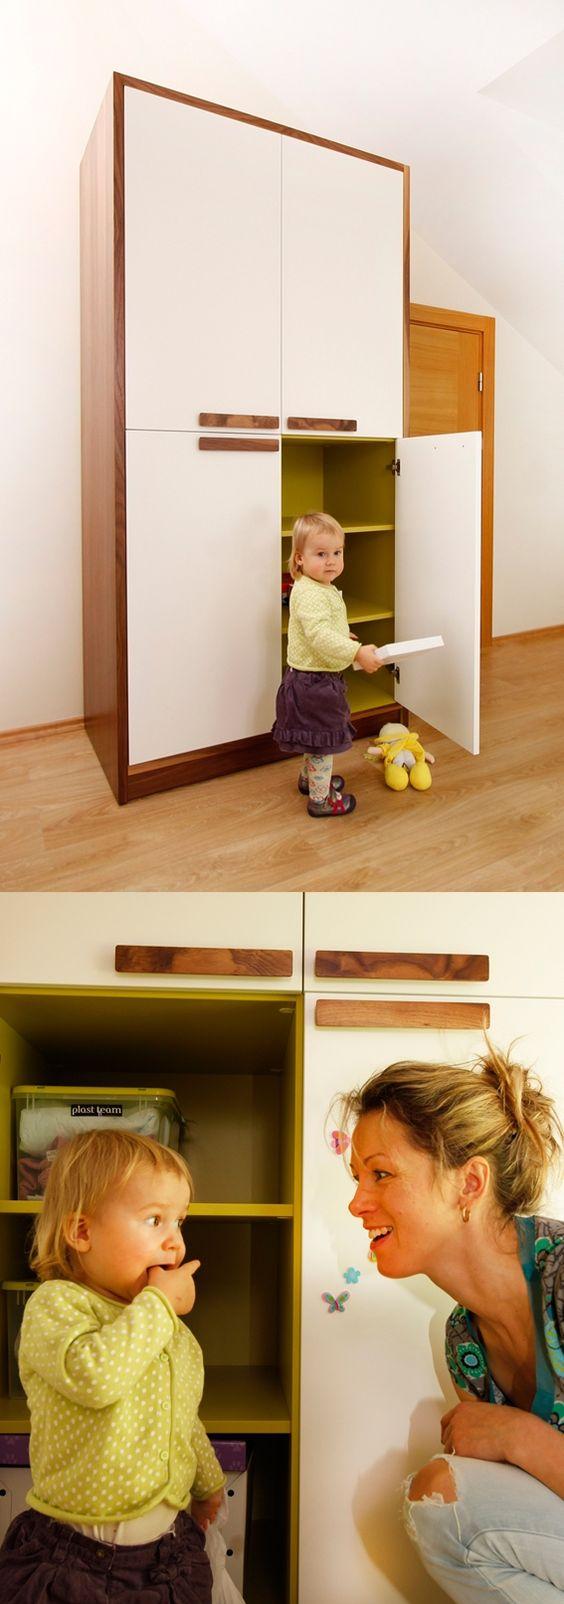 TRUE LATVIA design embassy - KD studio - kids furniture made by Latvian designer Ivars Lacis $2761.48   1EUR=1.36380USD http://truelatvia.lv/en/true-designers/ivars-lacis